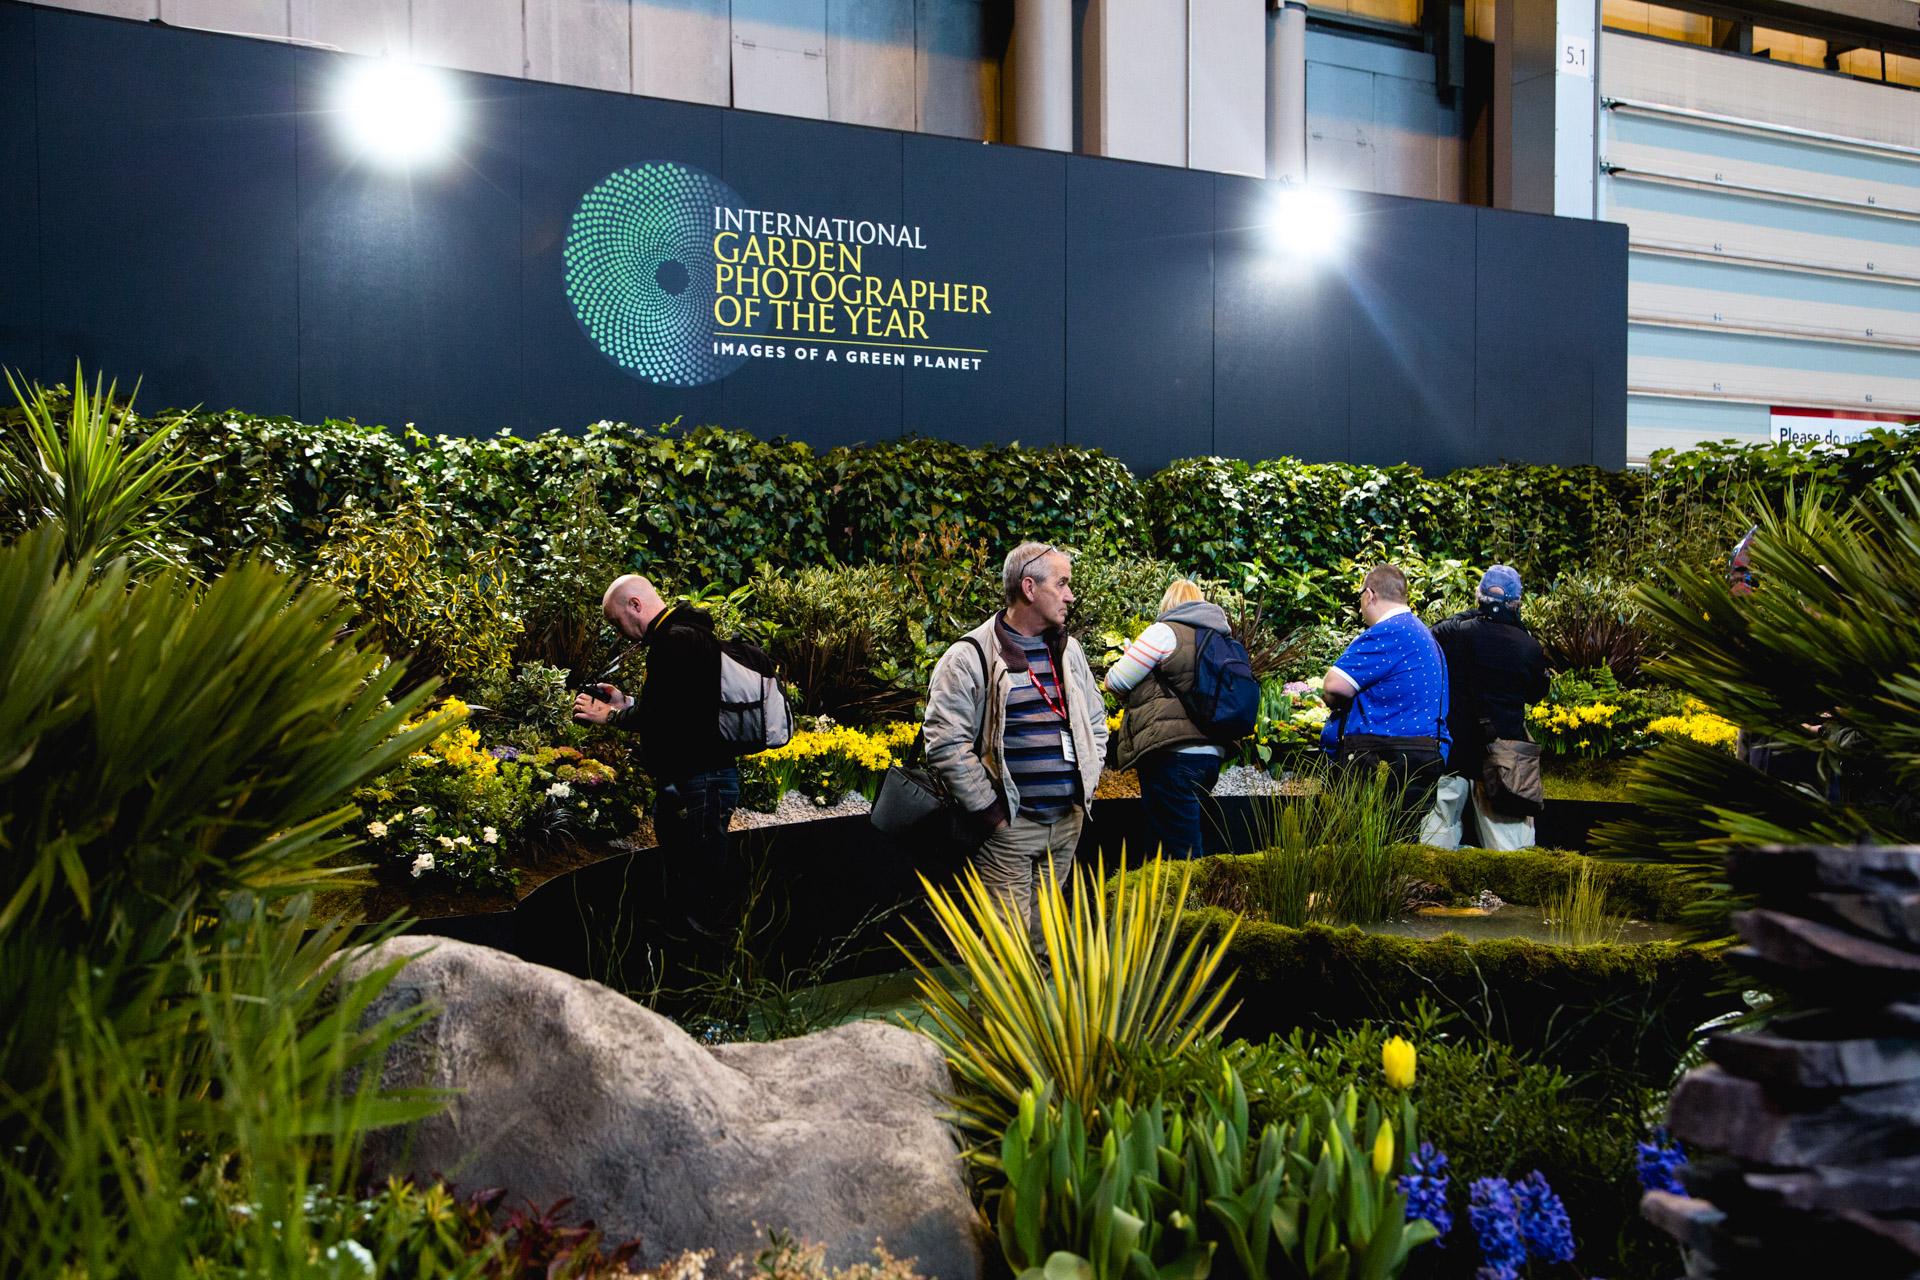 International Garden Photographer of the Year's garden area.